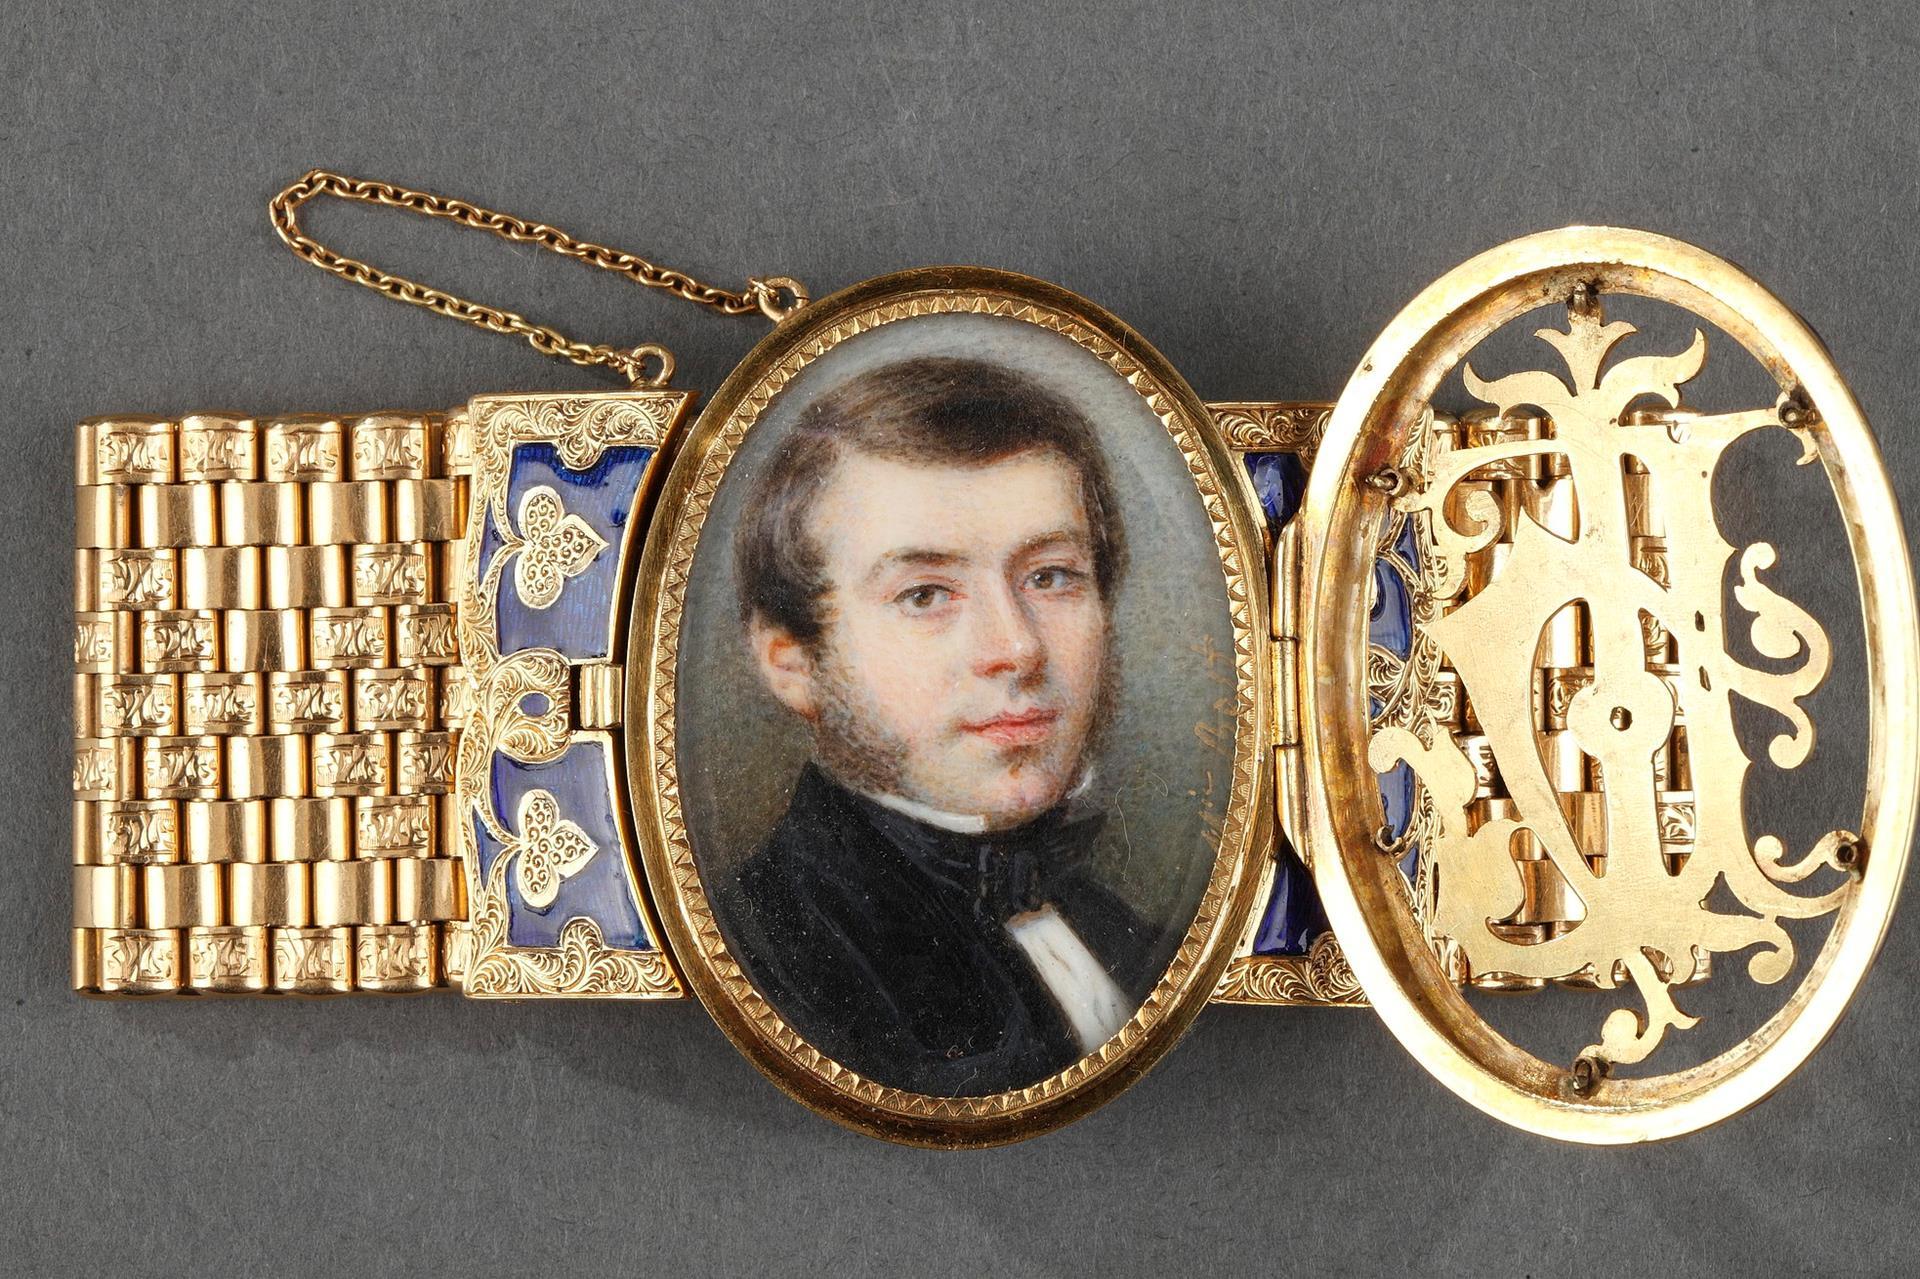 Gold and enamel miniature bracelet, Bost, 19th century.